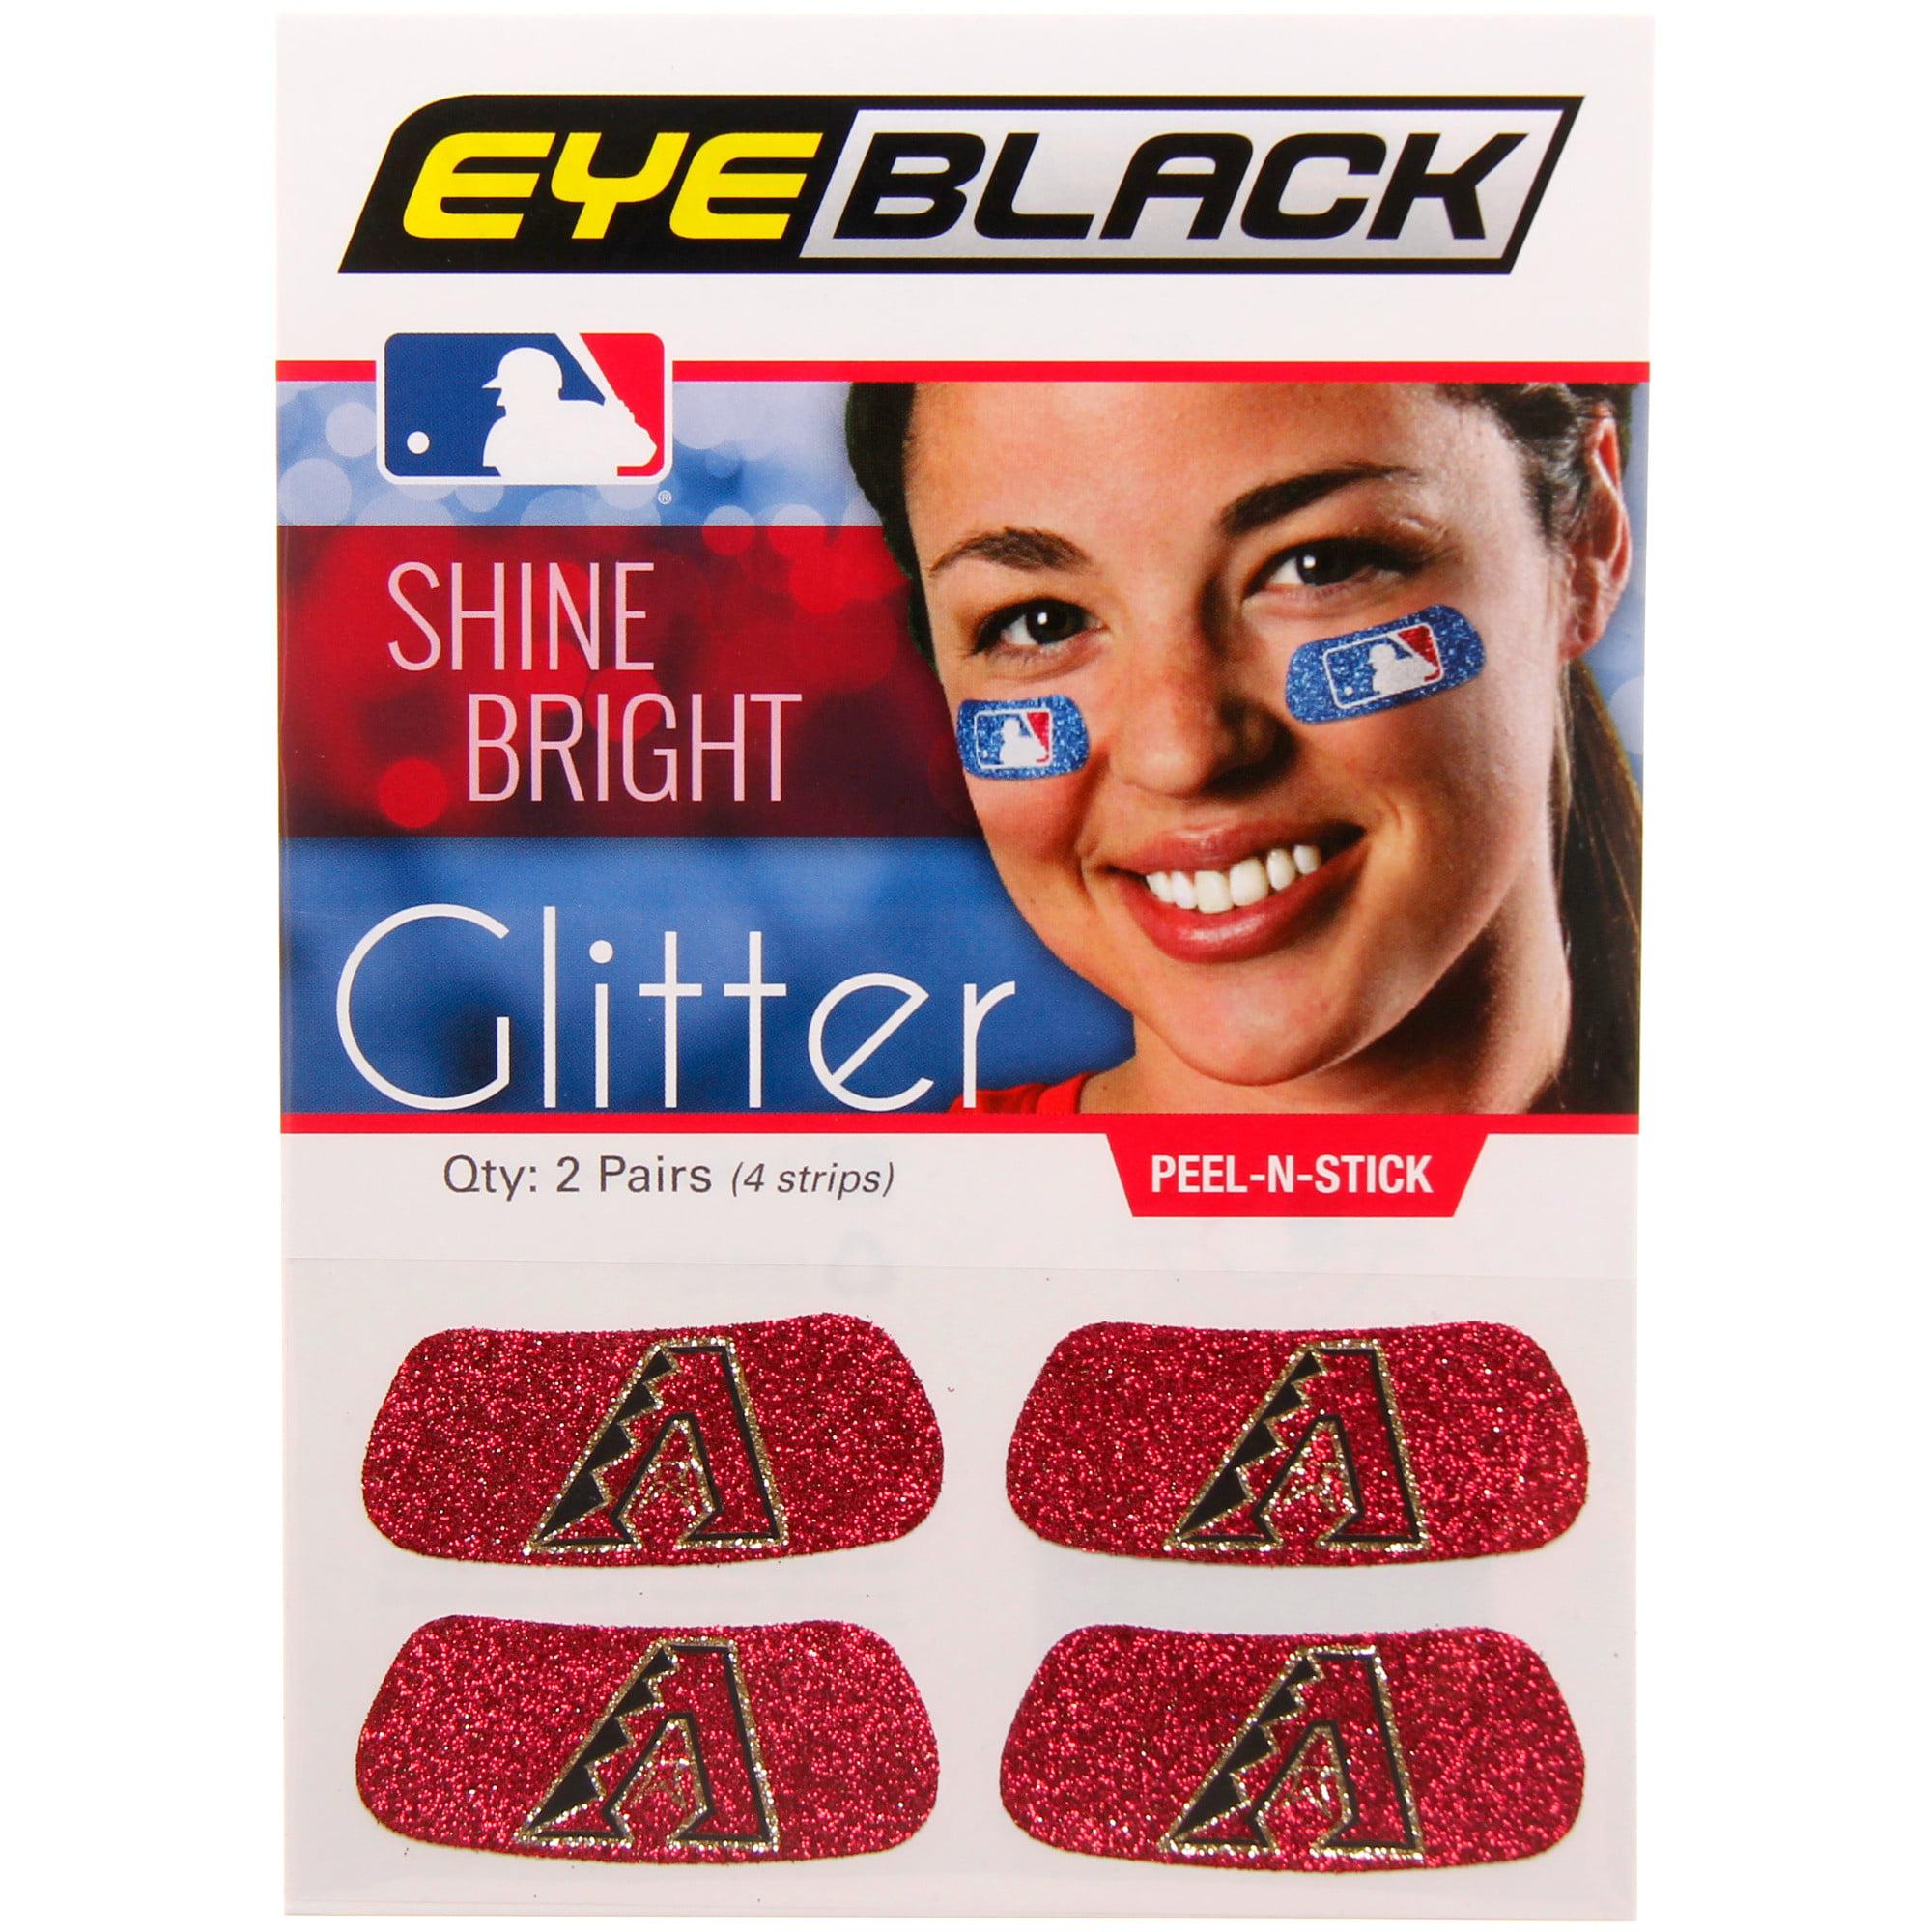 Arizona Diamondbacks Glitter Eyeblack - No Size